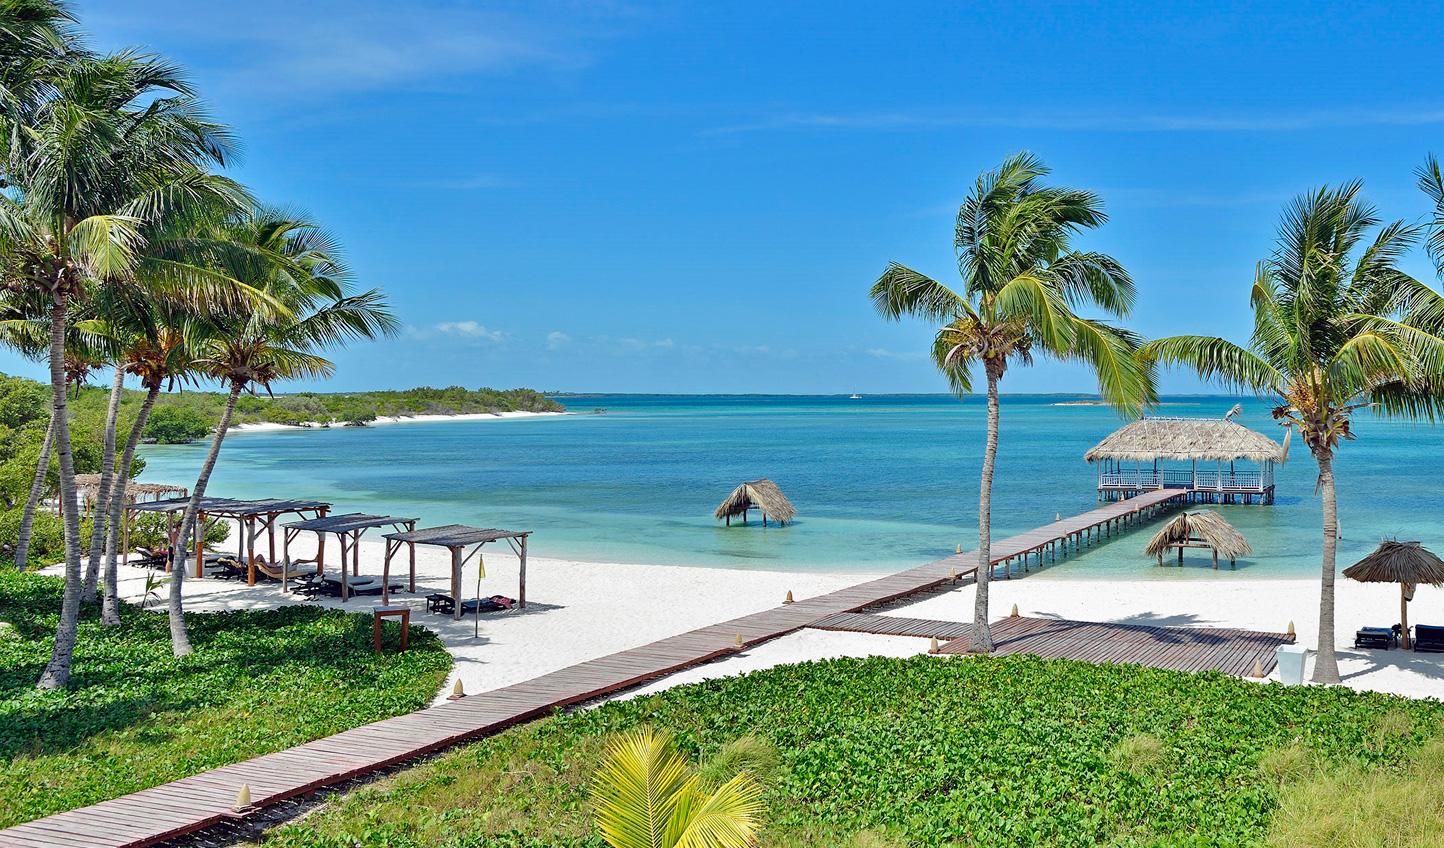 Discover Cuba's tropical paradise